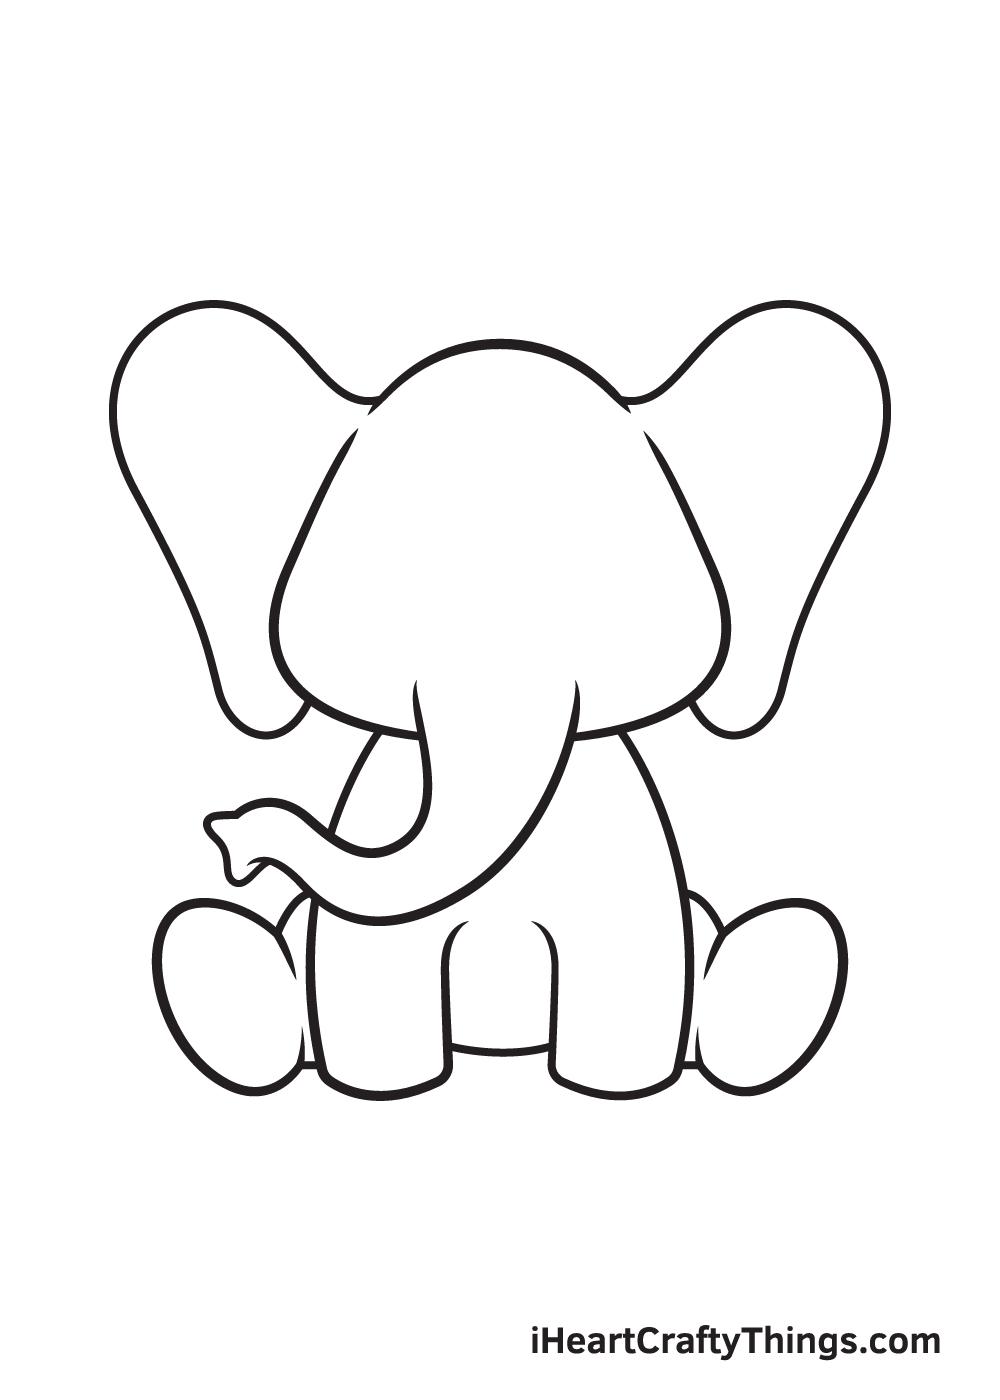 Vẽ con voi - Bước 7